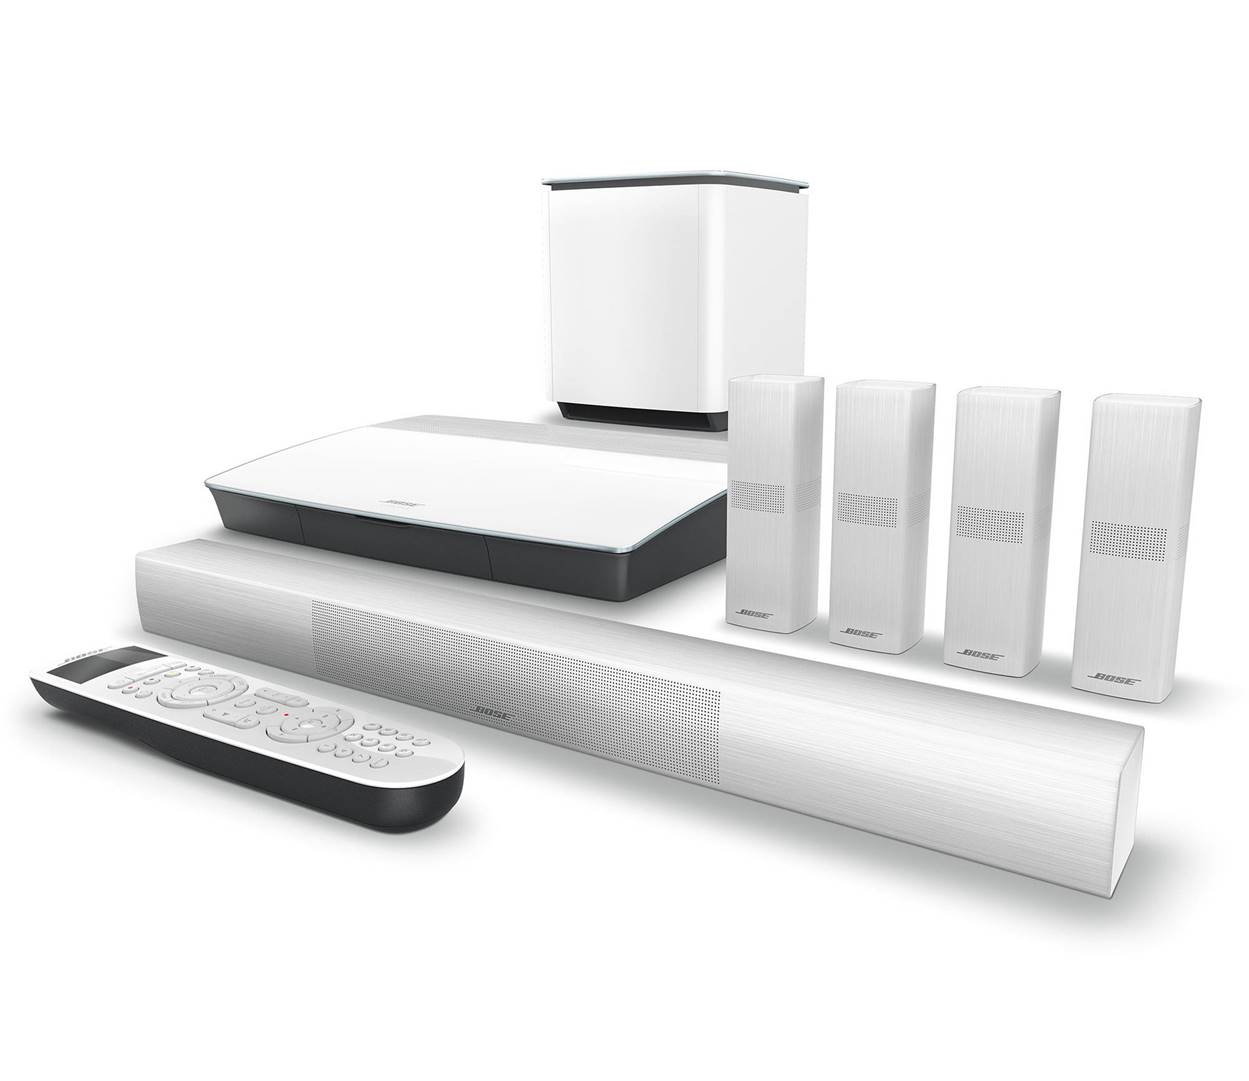 Bose Lifestyle 650 Wireless Surround Sound